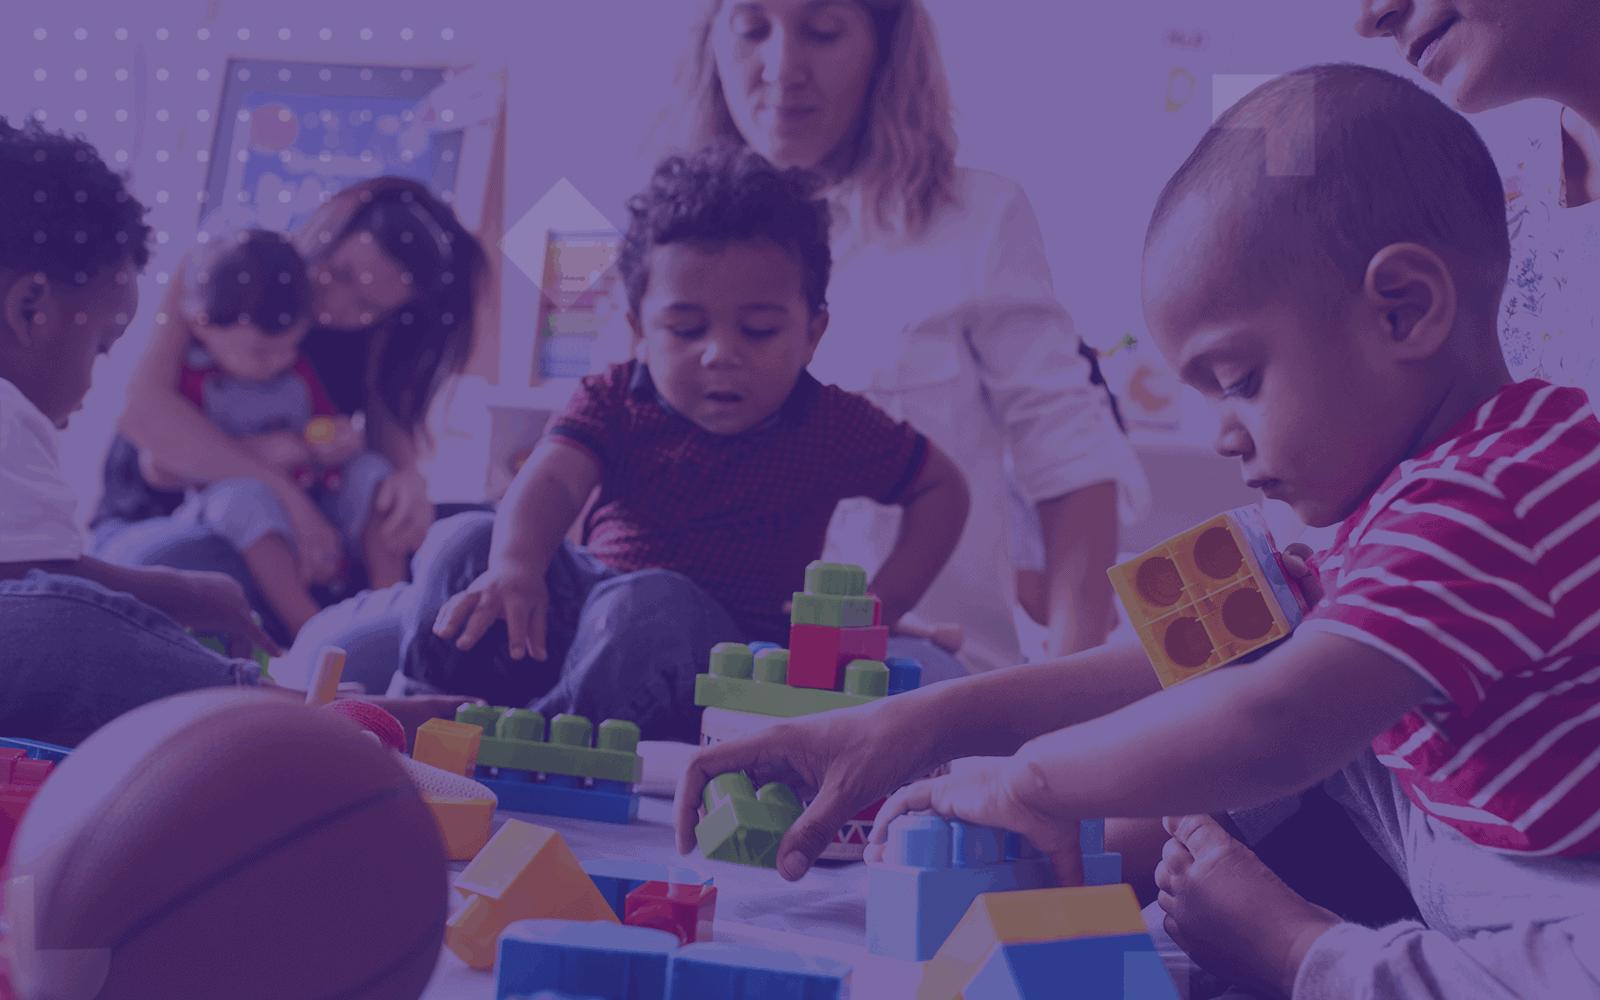 Children in child care center